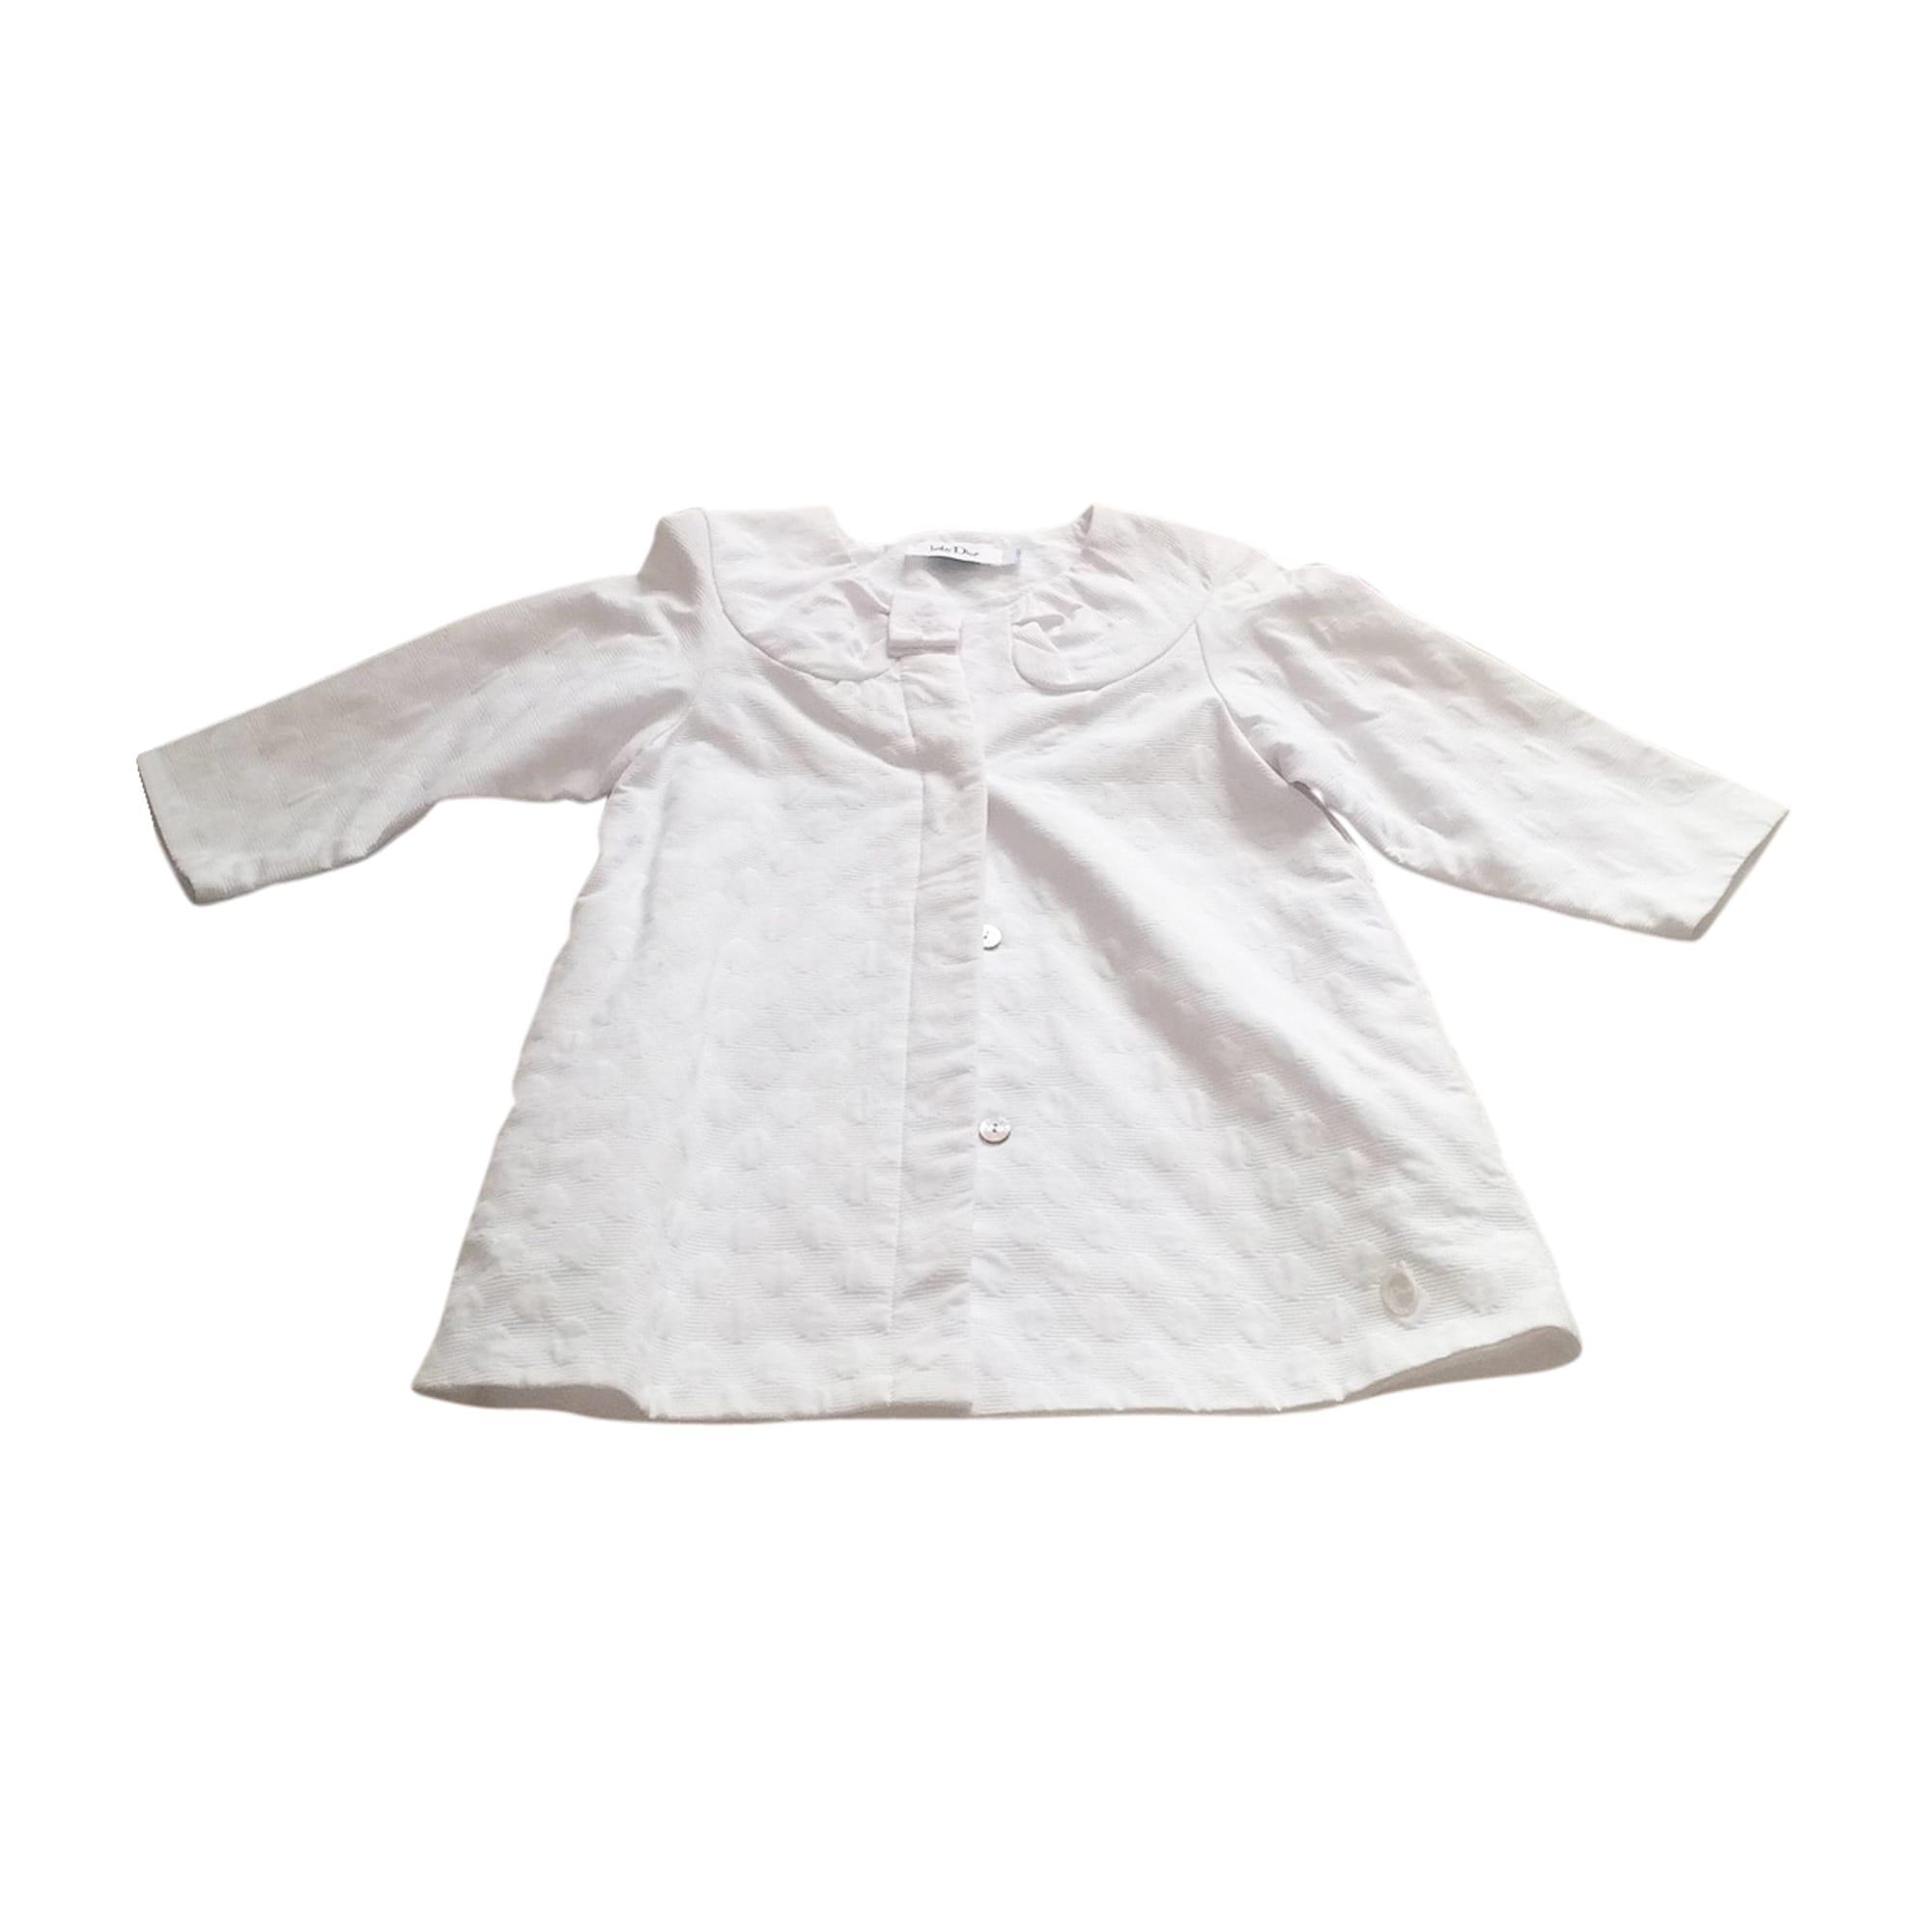 Manteau BABY DIOR Blanc, blanc cassé, écru